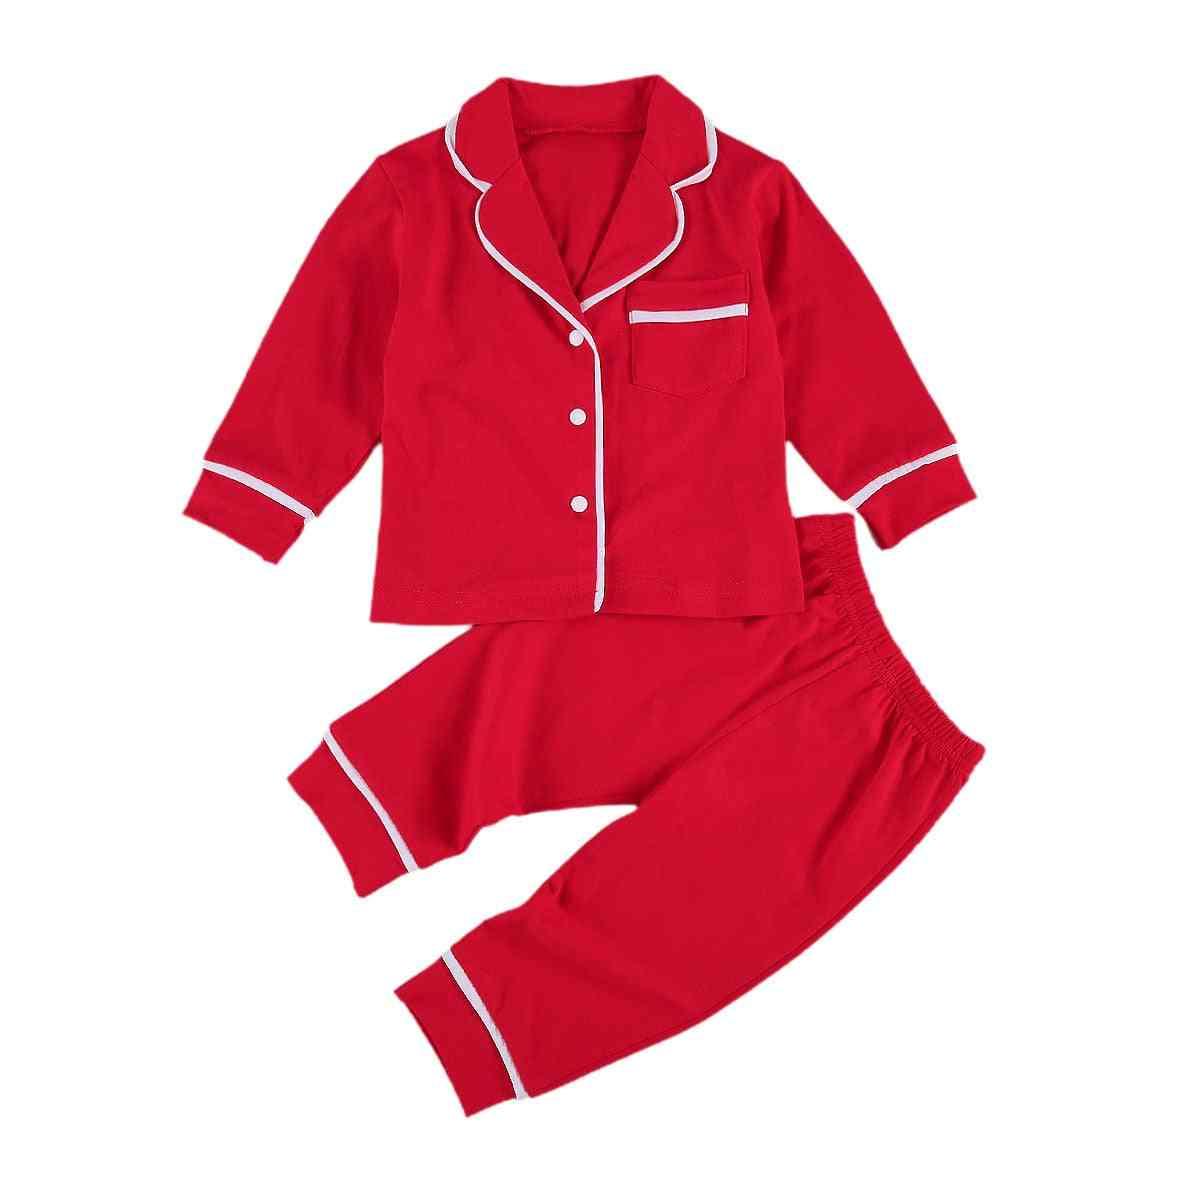 Solid Cotton Infant Pajamas Sleepwear Sets